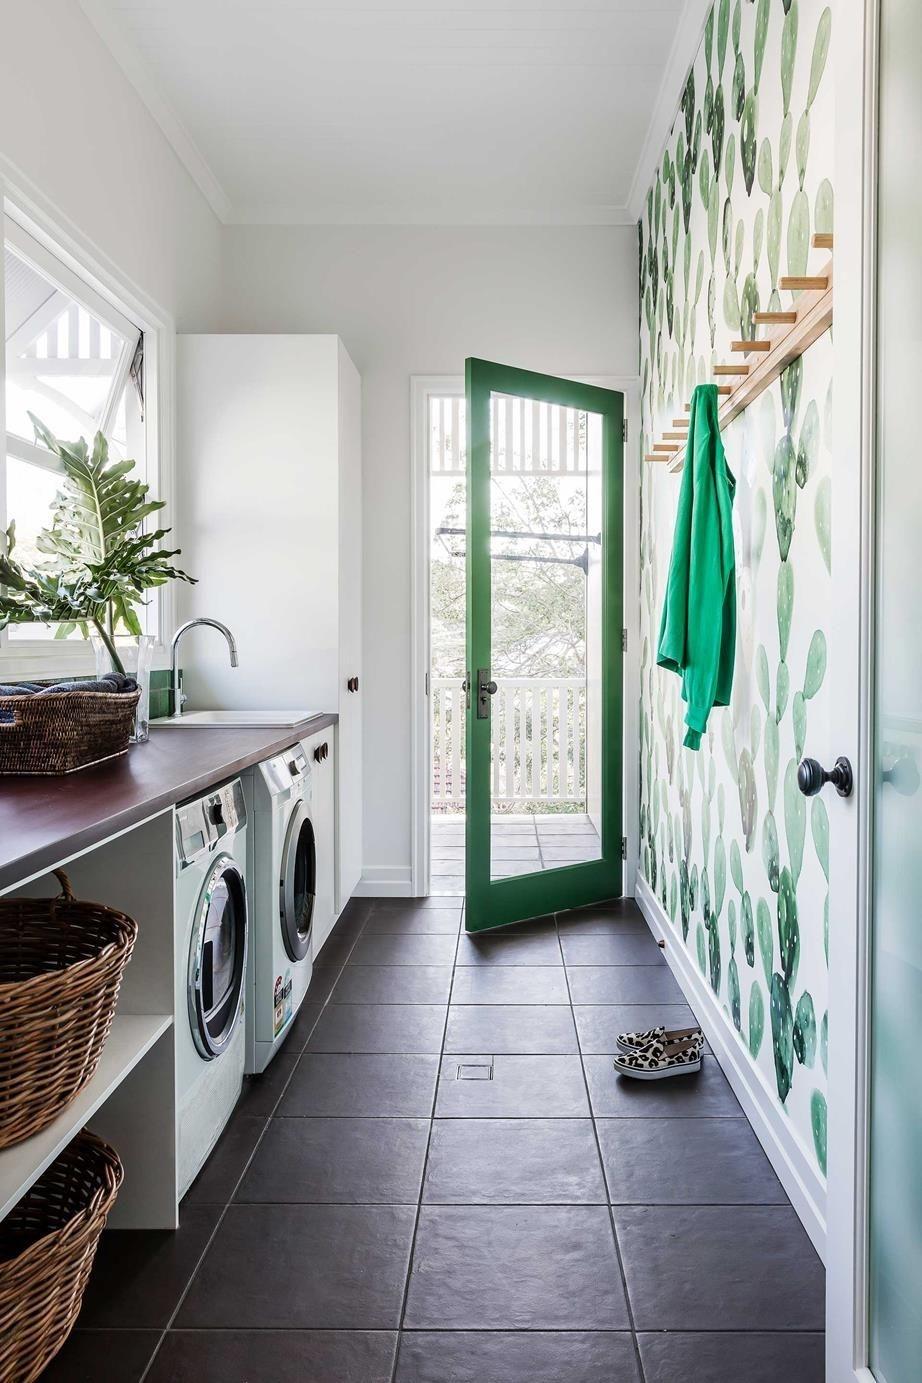 Brilliant Small Laundry Room Decor Ideas22